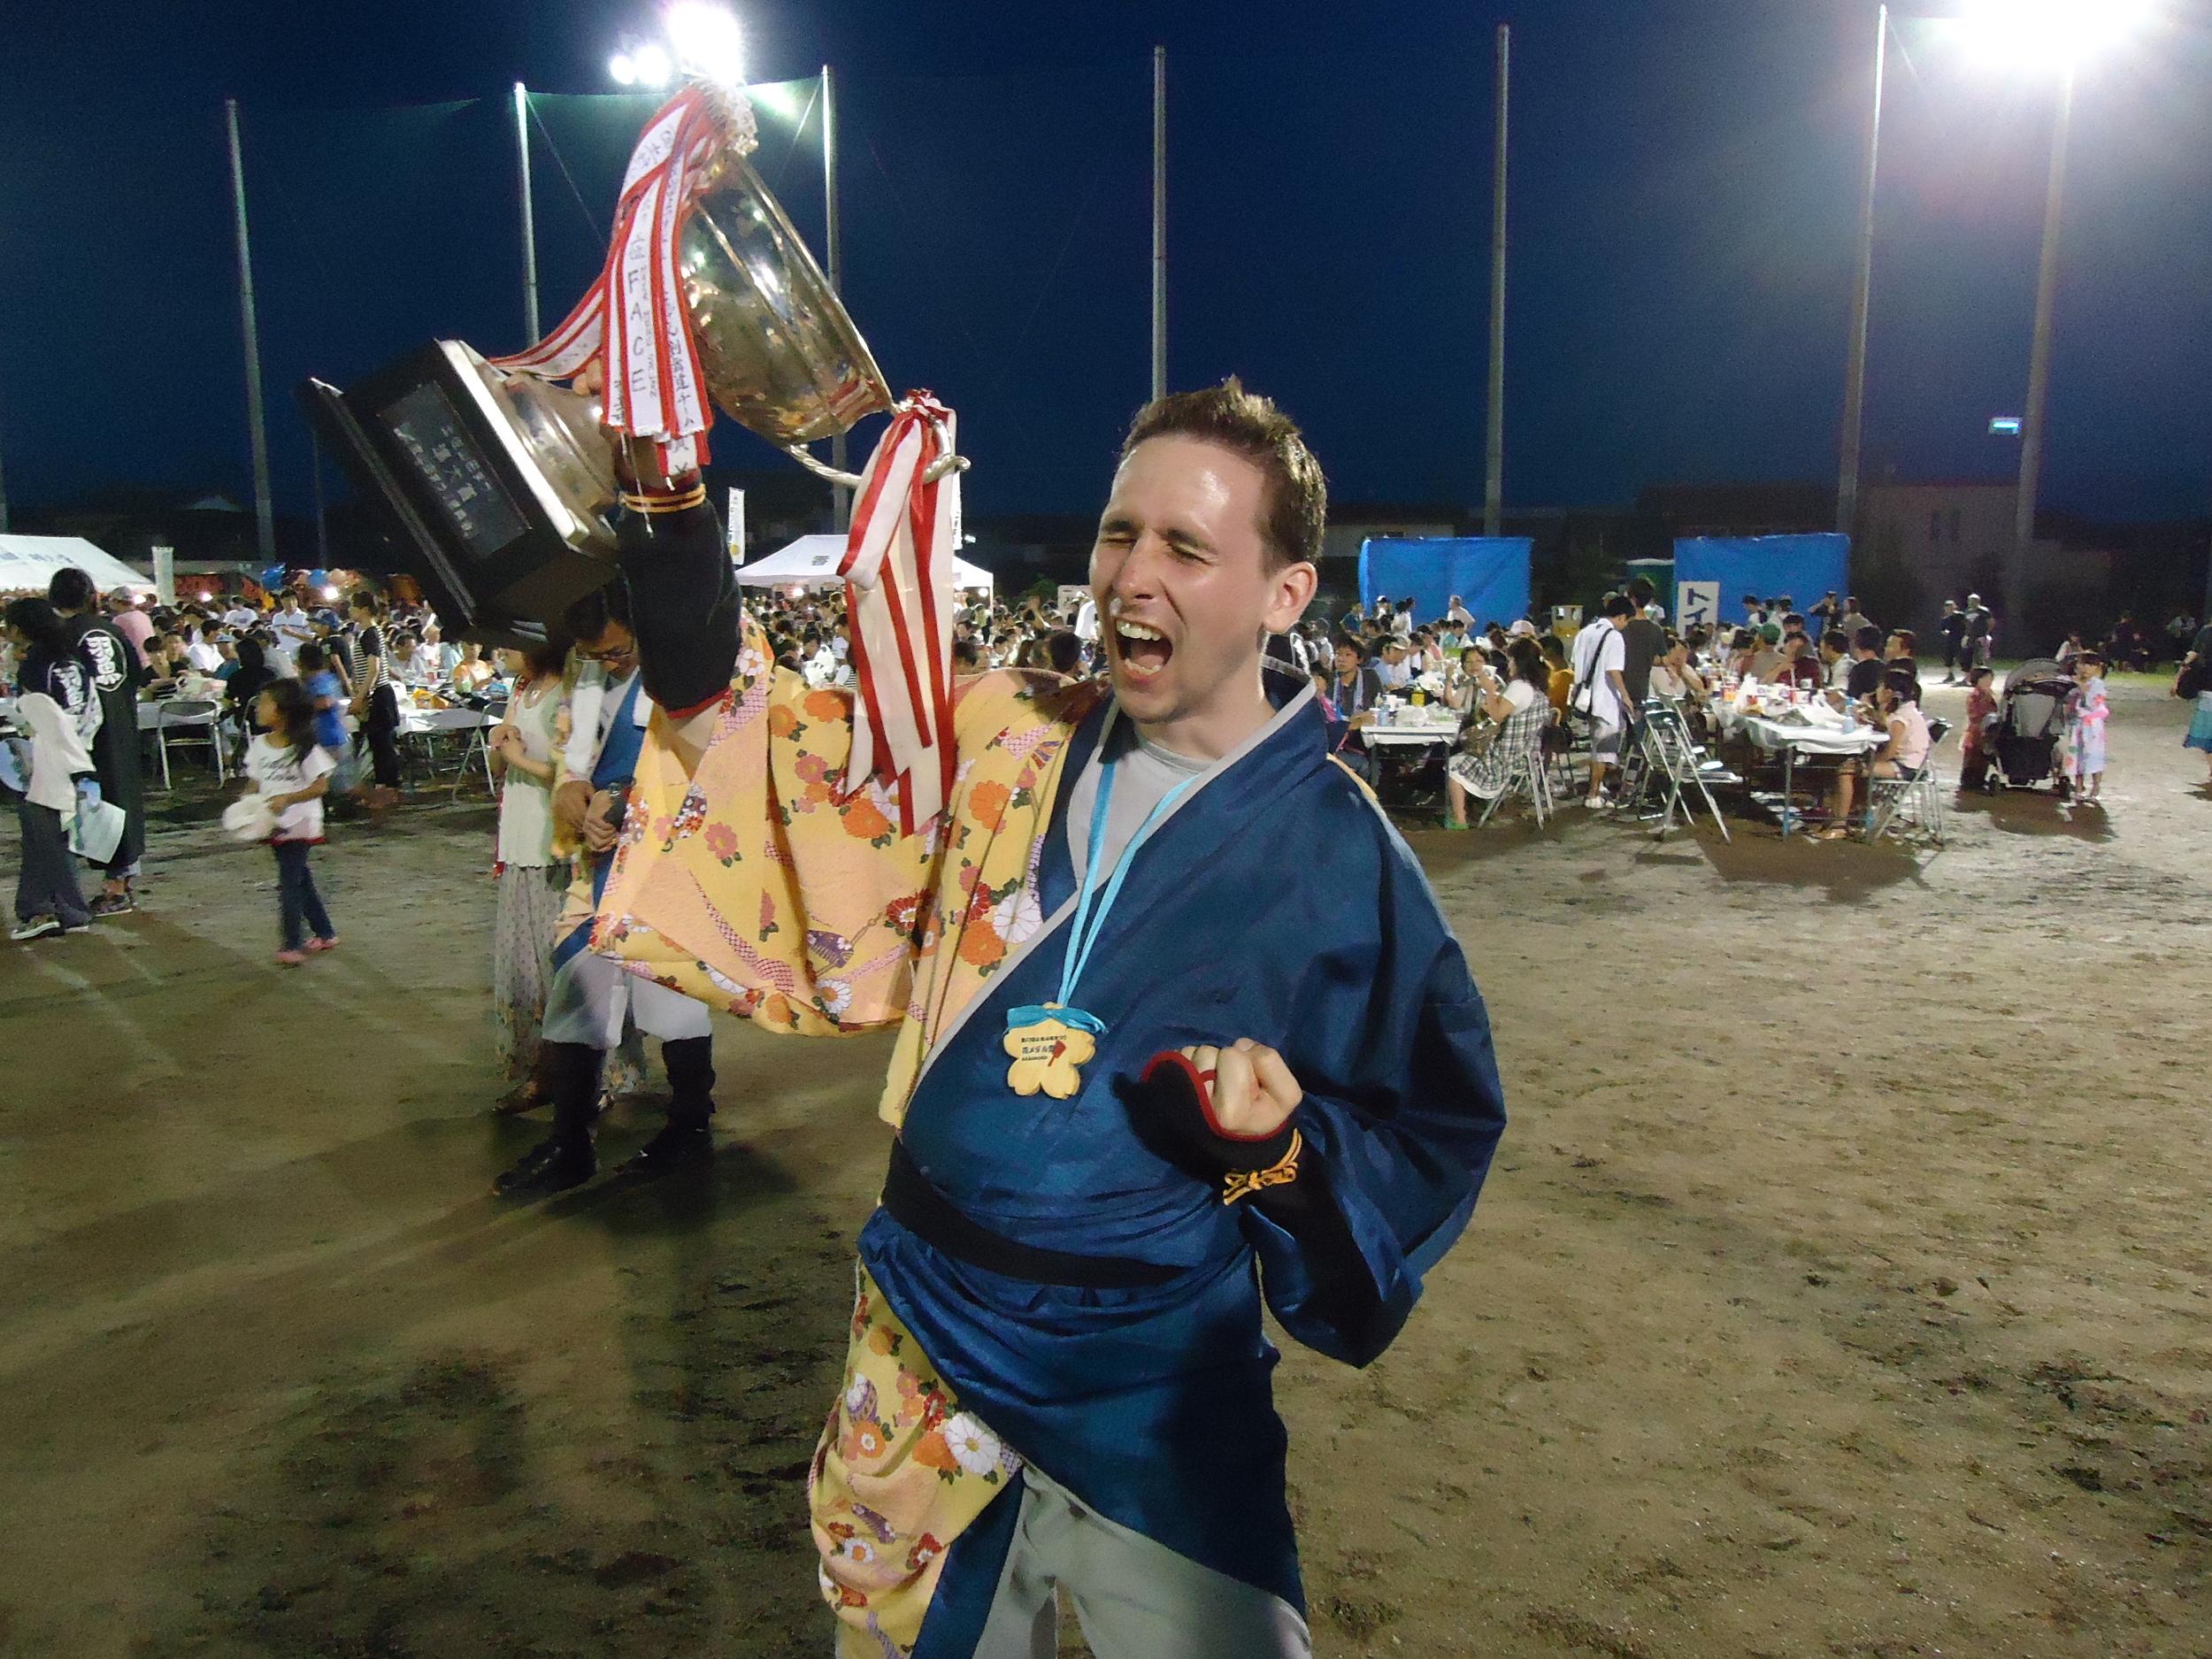 Yosakoi Soran 3rd place